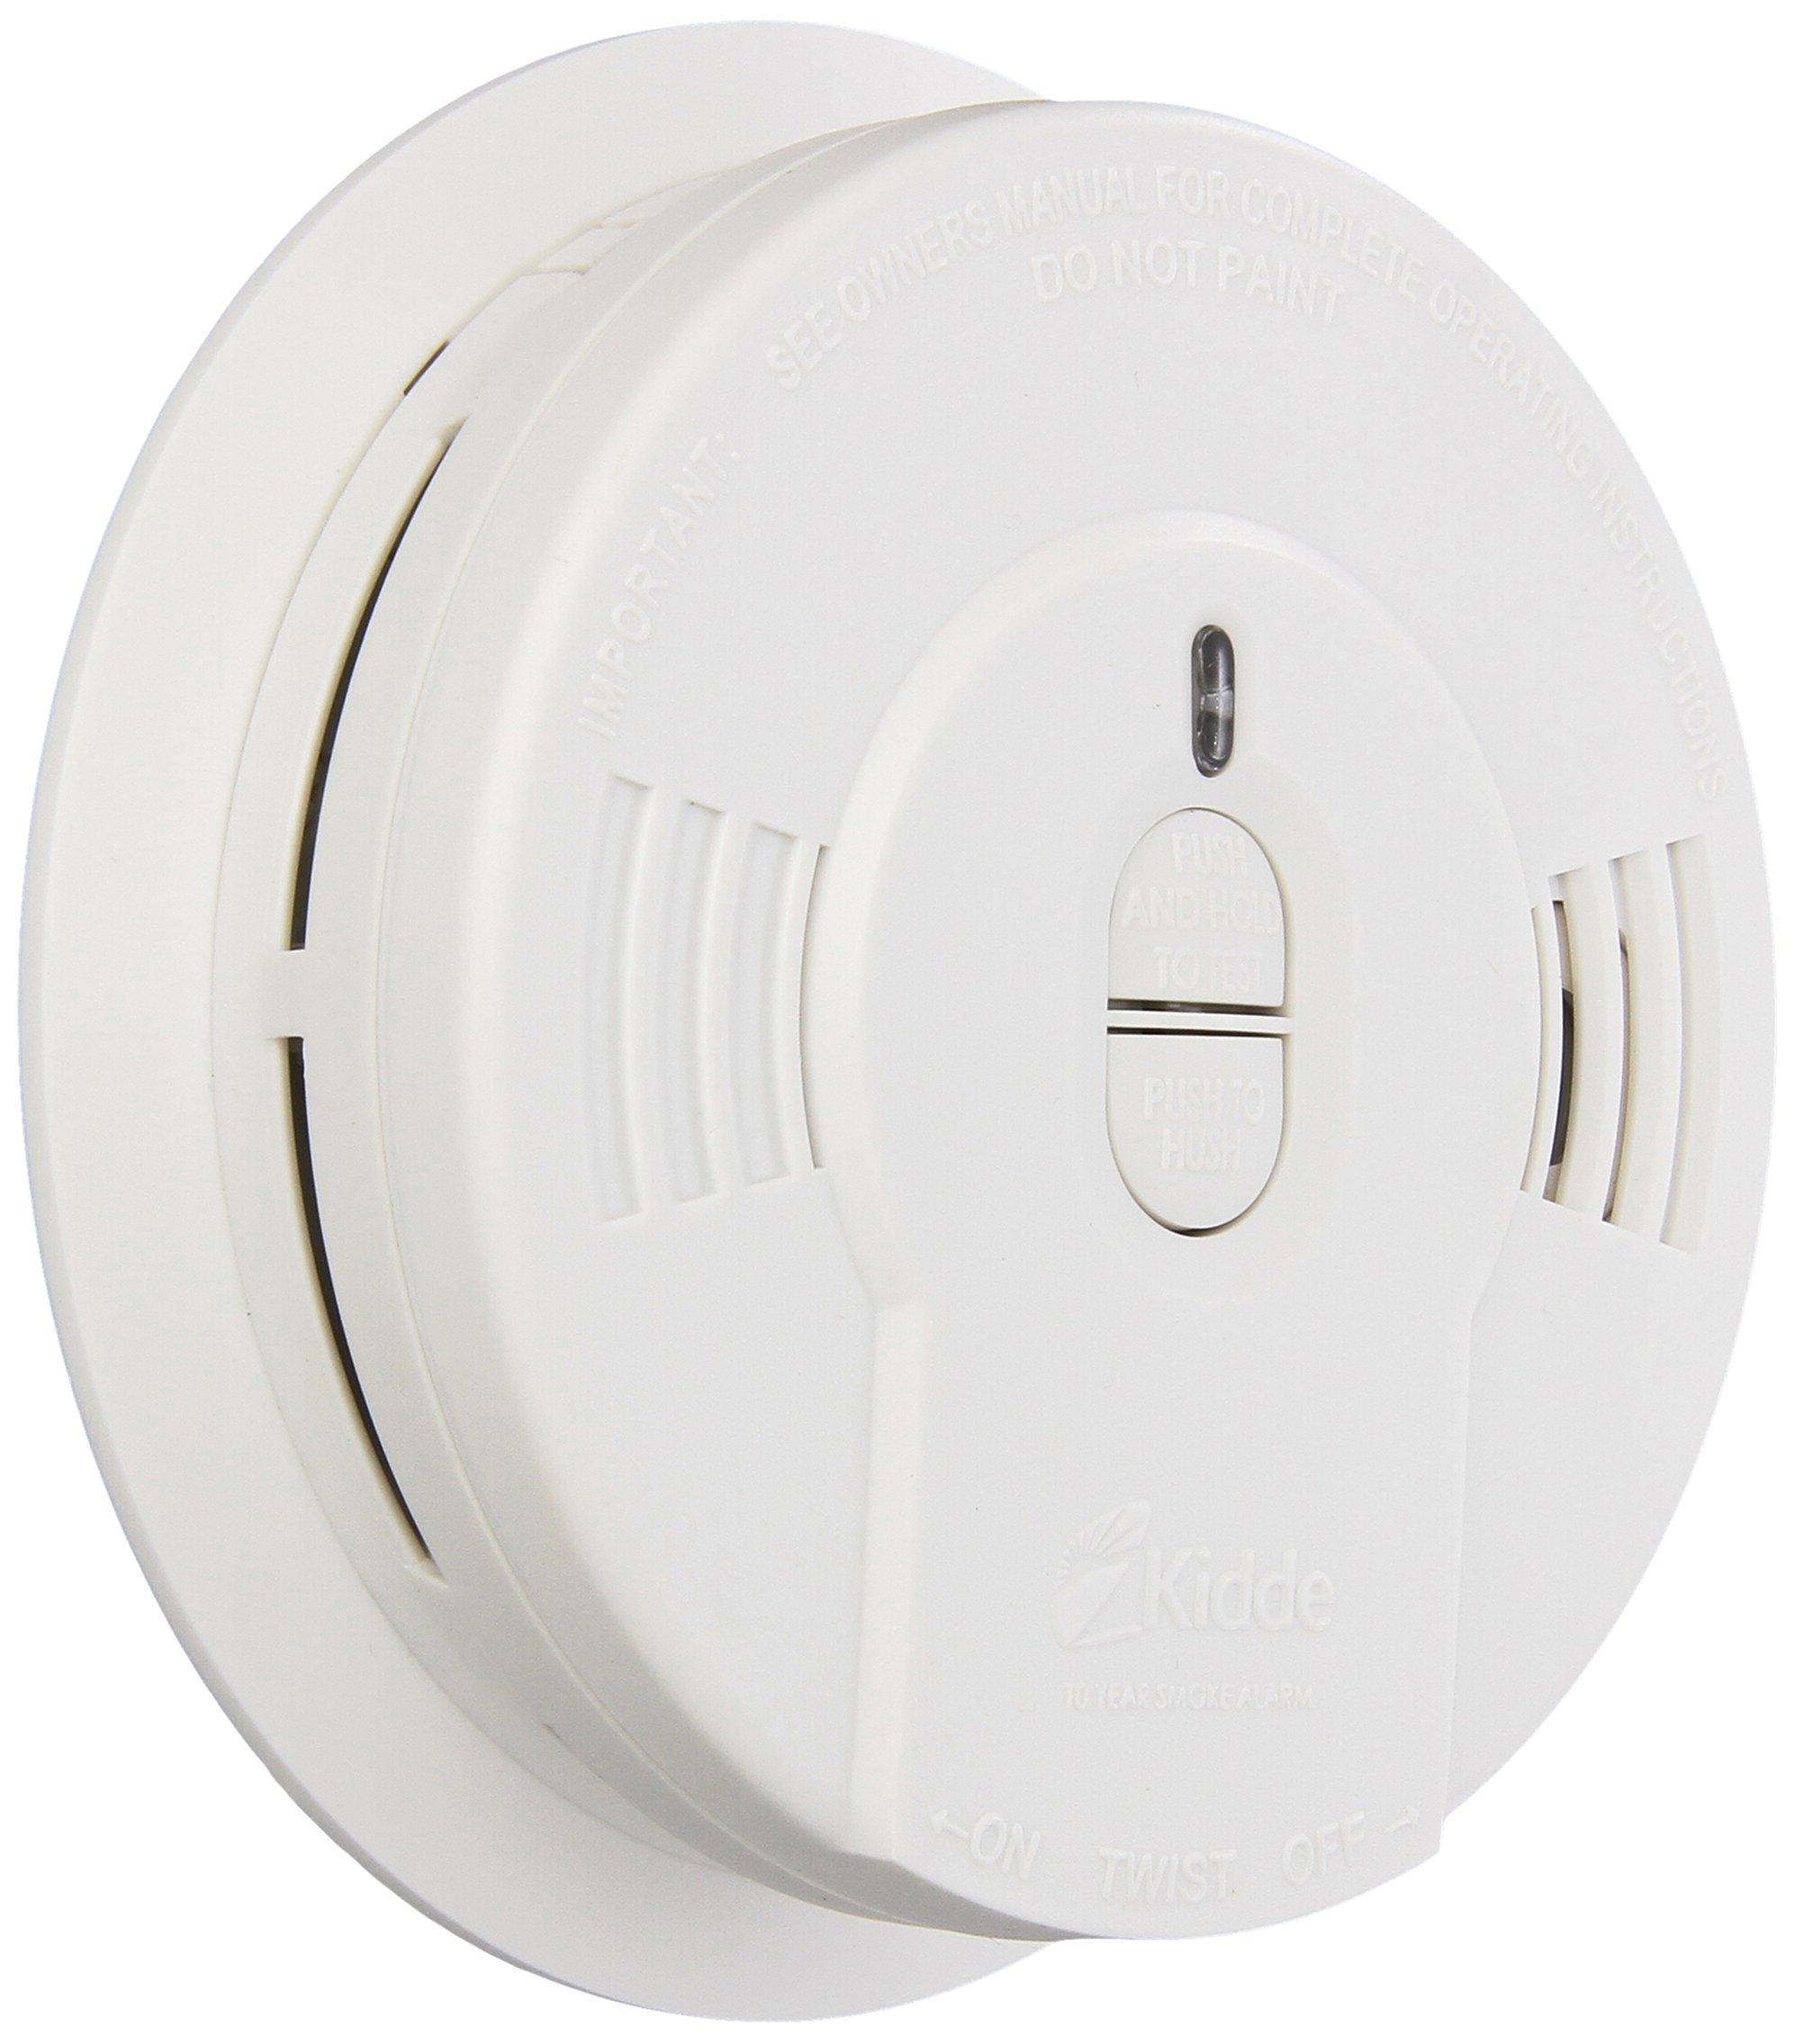 Kidde 408-900-0136-003 i9010 Sealed Battery Smoke Alarm with Smart Hush by Kidde